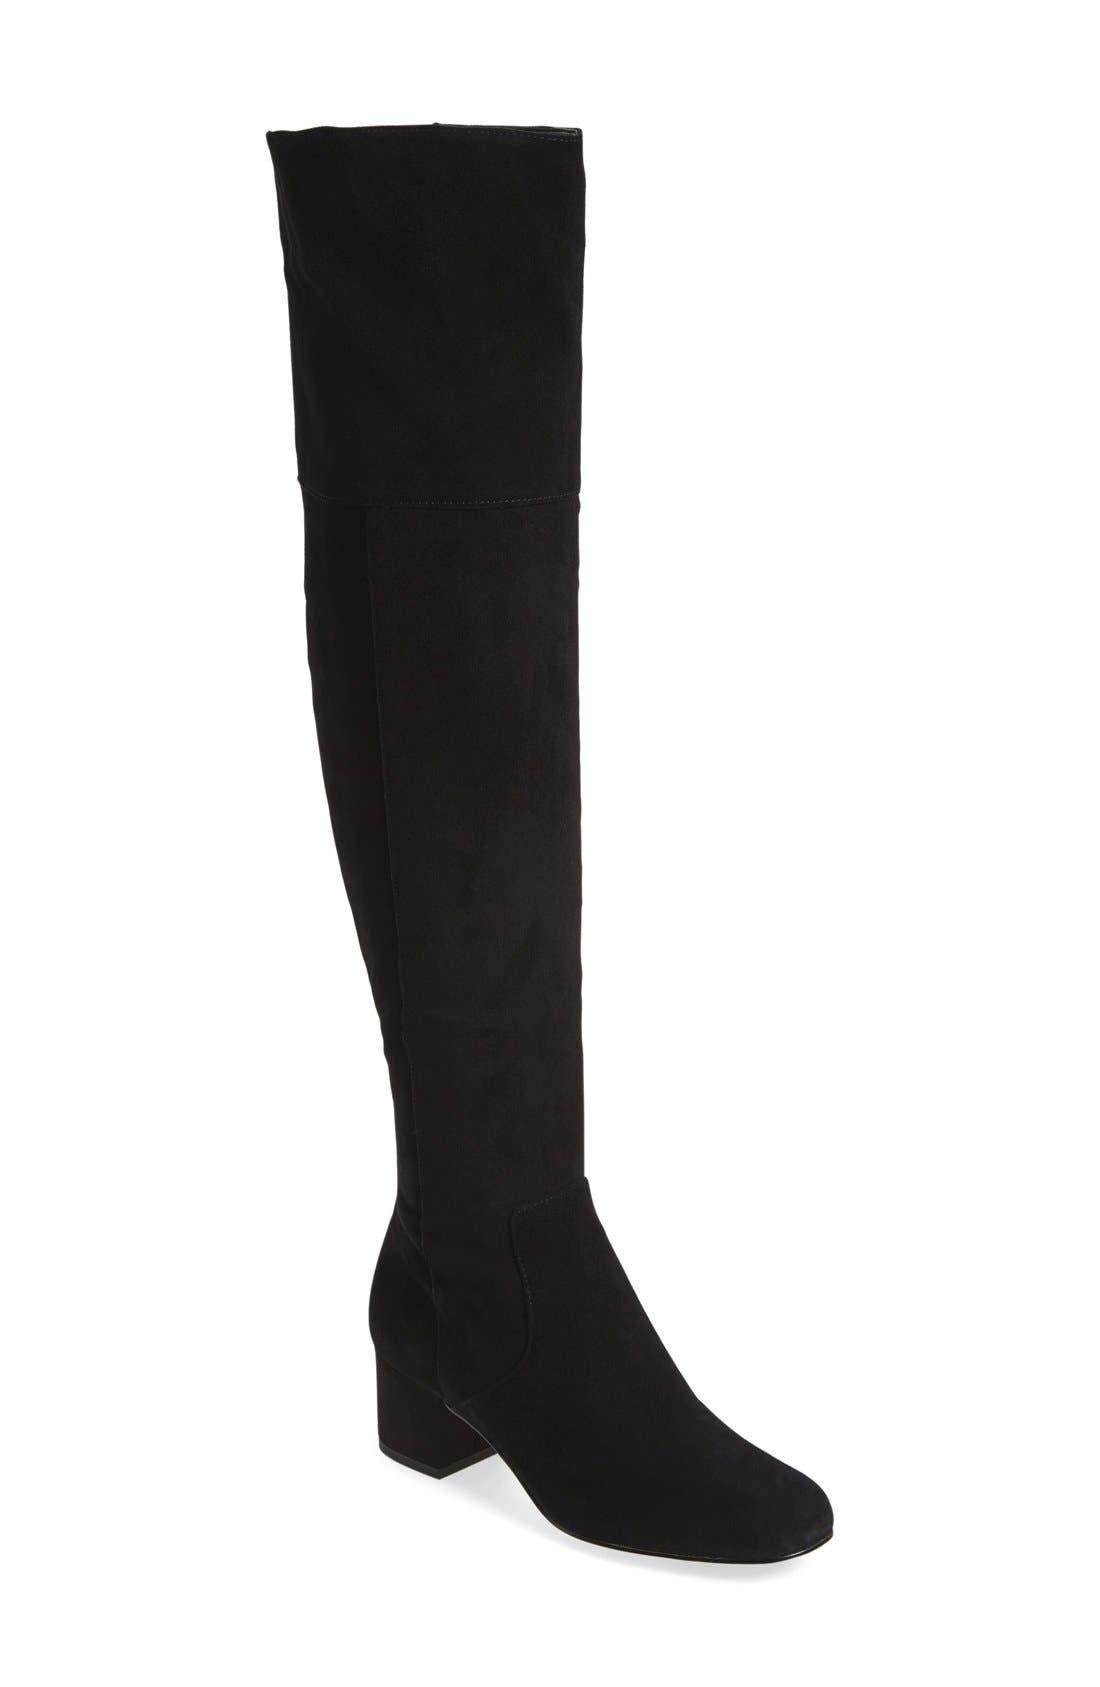 Alternate Image 1 Selected - Sam Edelman 'Elina' Over the Knee Boot (Women)